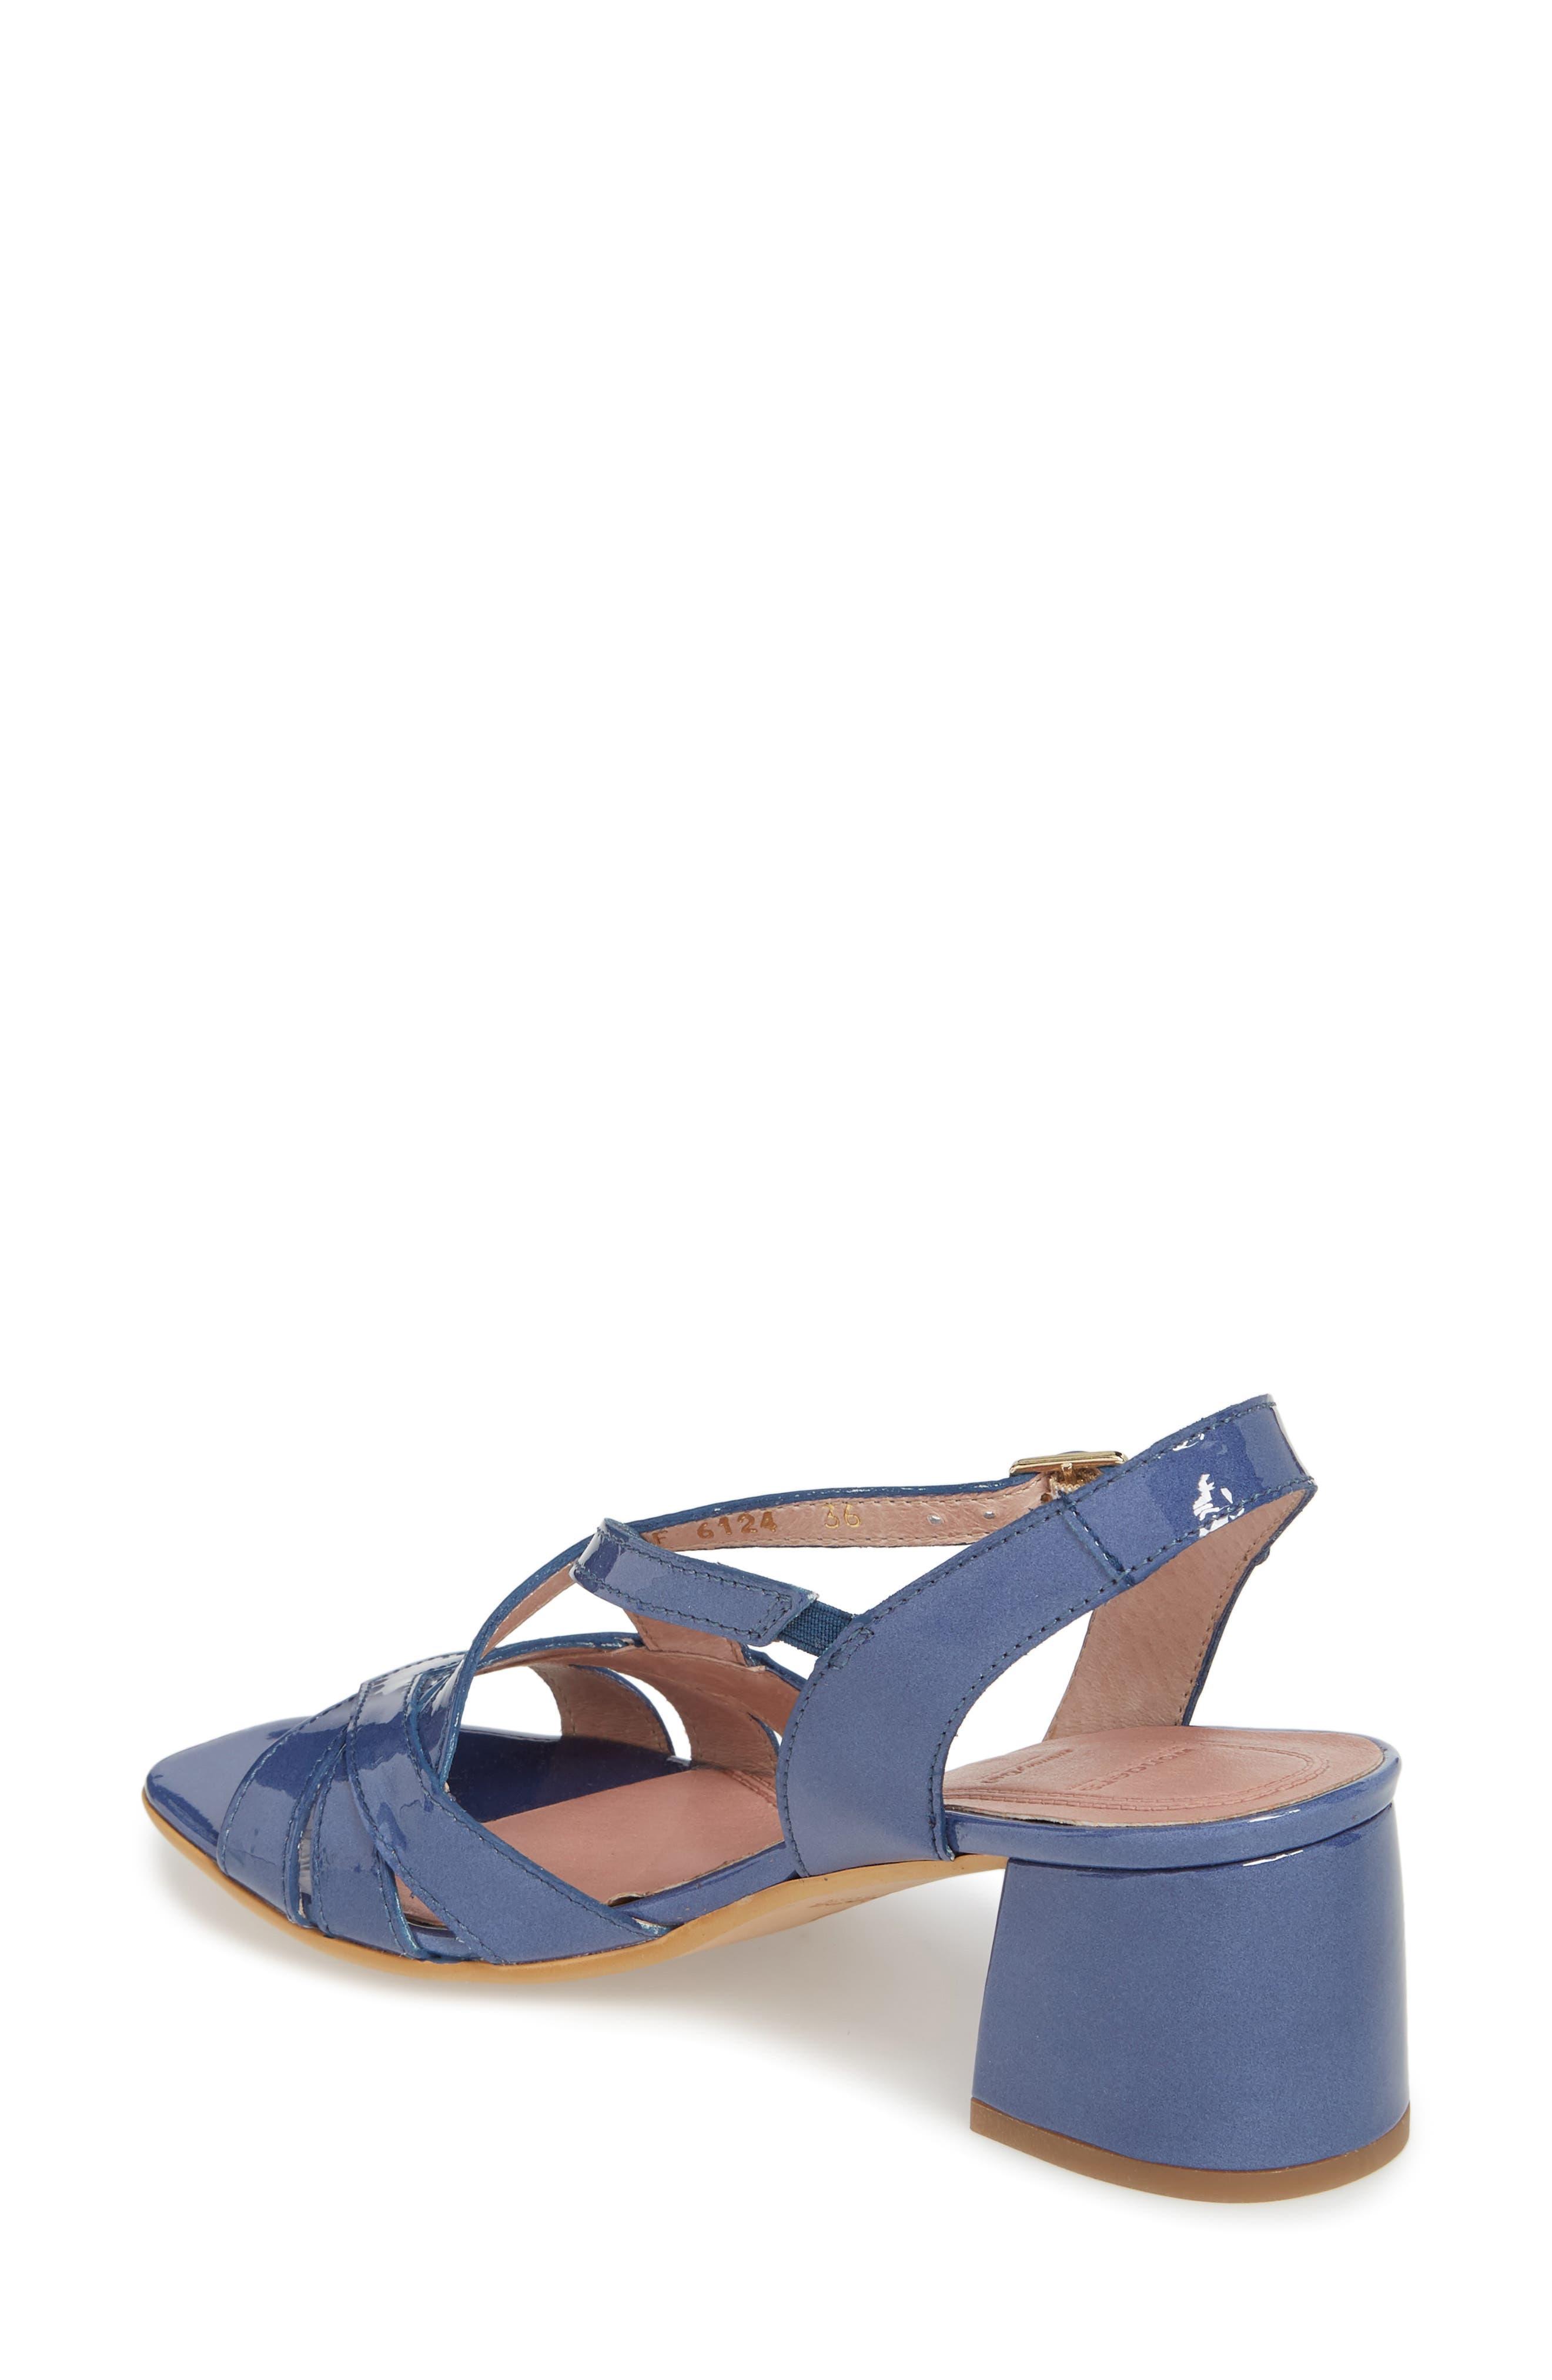 Block Heel Sandal,                             Alternate thumbnail 2, color,                             Jean Patent Leather